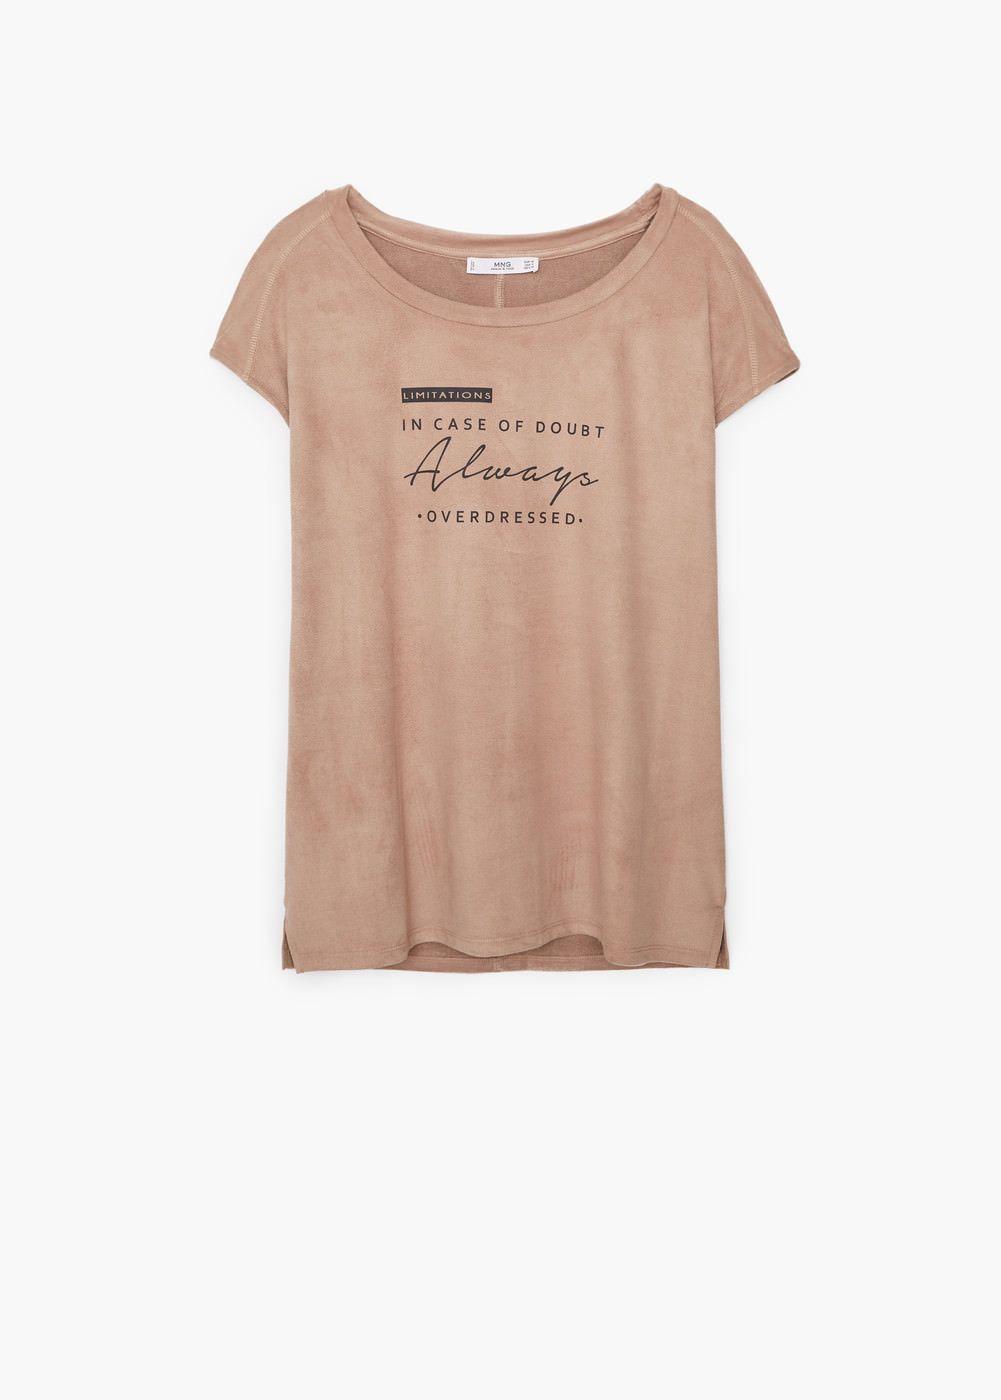 Camiseta Estampada Mujer Camisas Estampadas Camisas Para Mulher Camisa Feminina